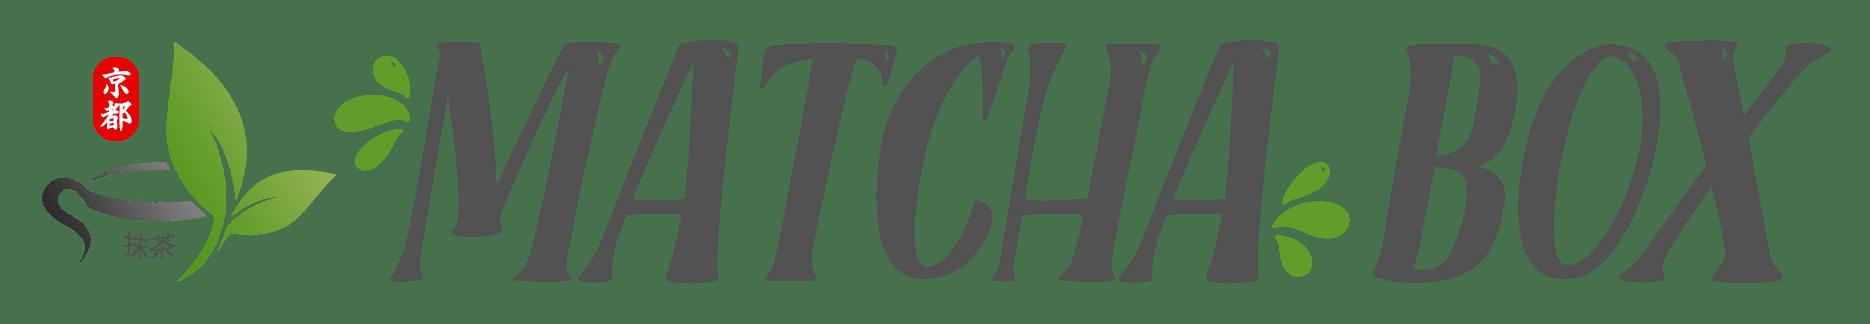 5 Elem Teái - MatchaBox - Sinensis System